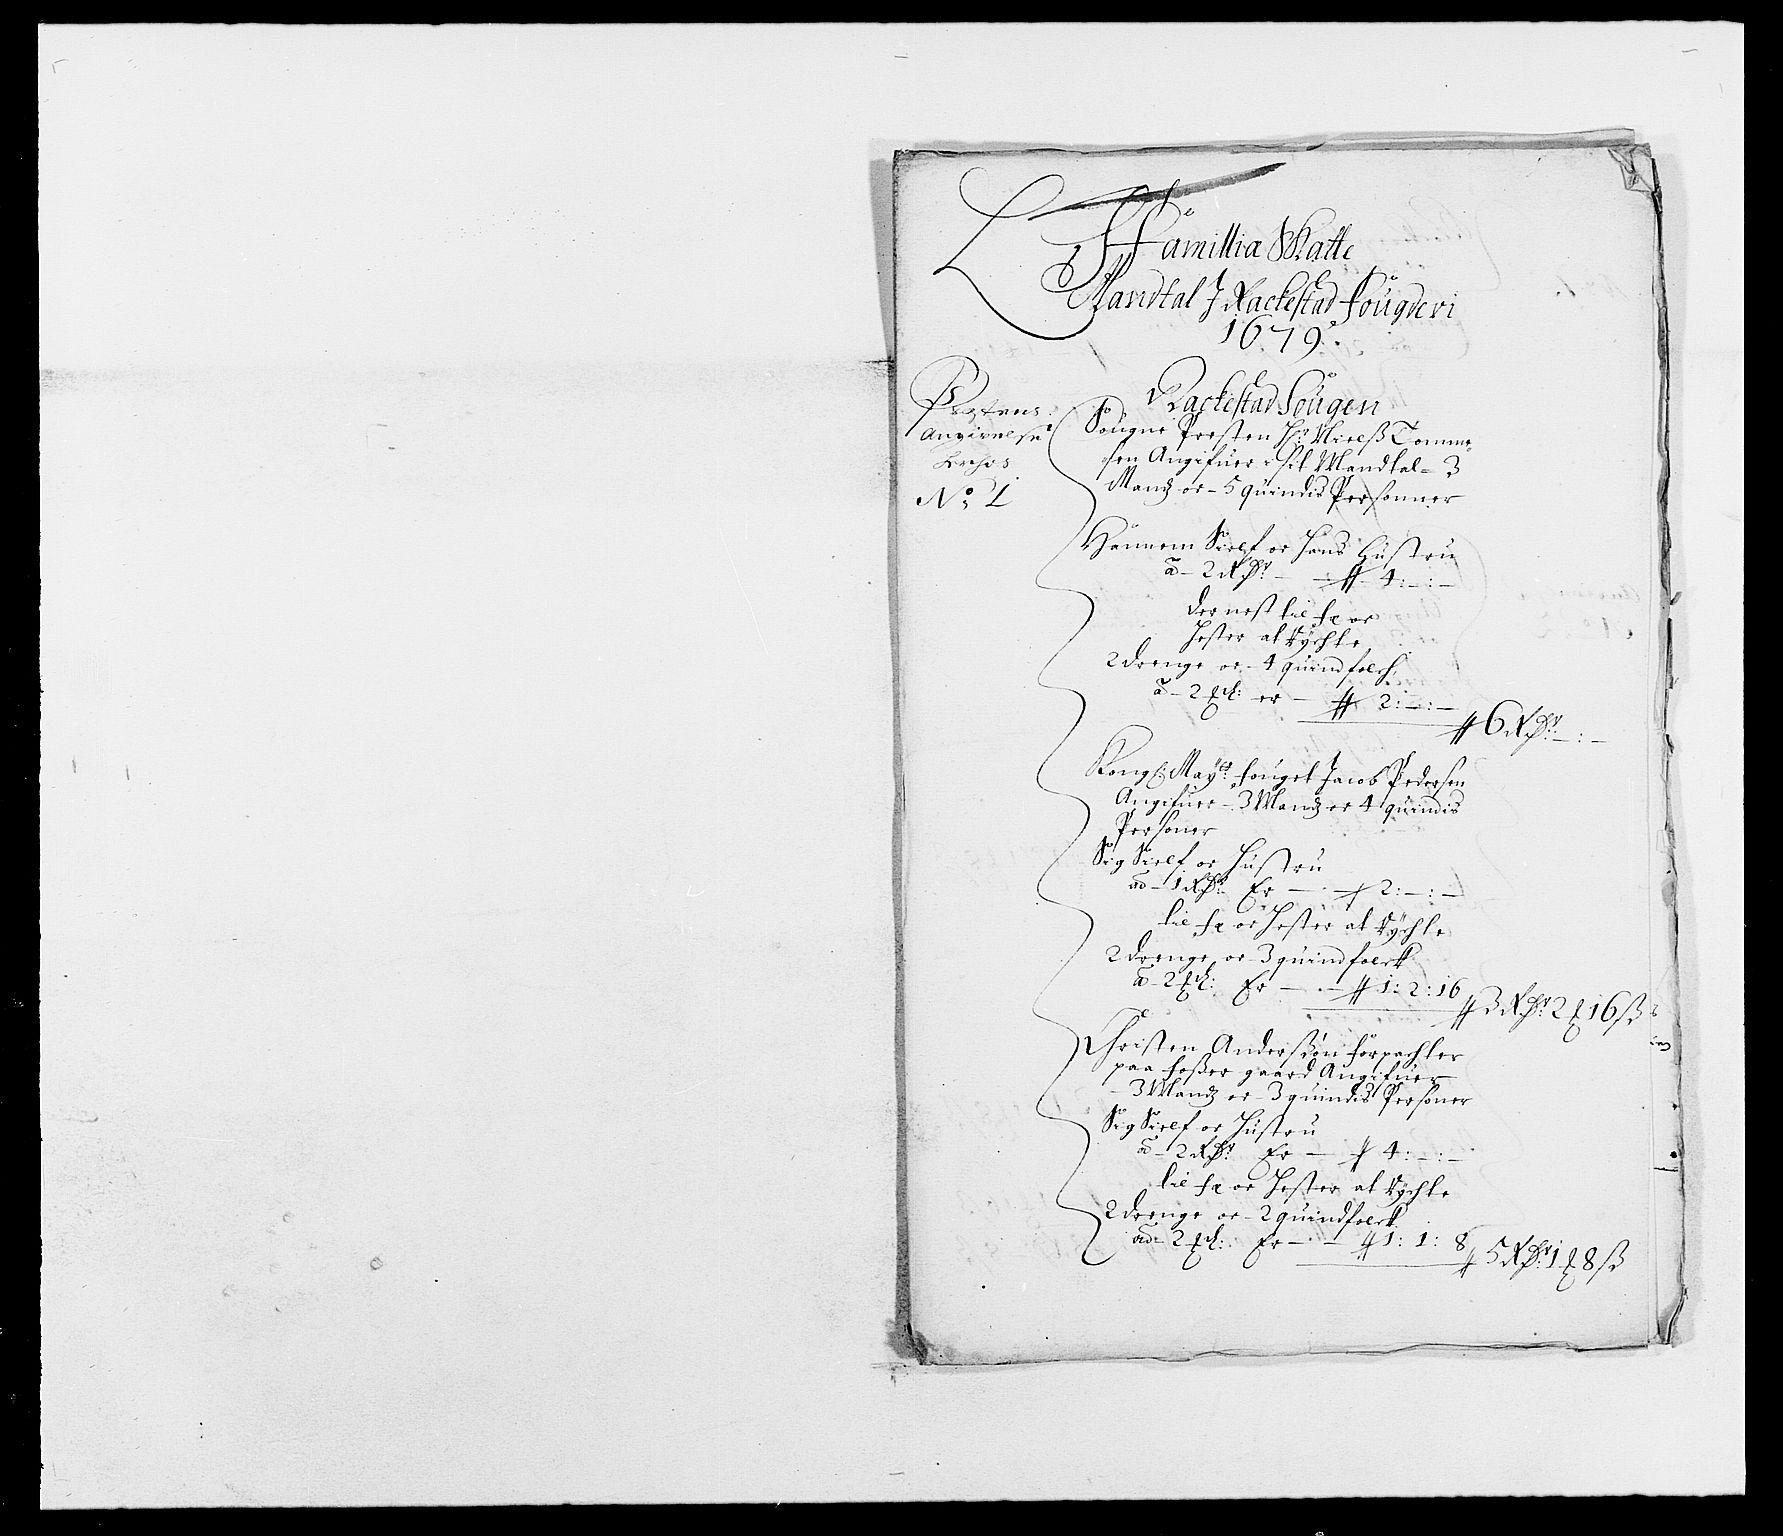 RA, Rentekammeret inntil 1814, Reviderte regnskaper, Fogderegnskap, R05/L0271: Fogderegnskap Rakkestad, 1678-1679, s. 445